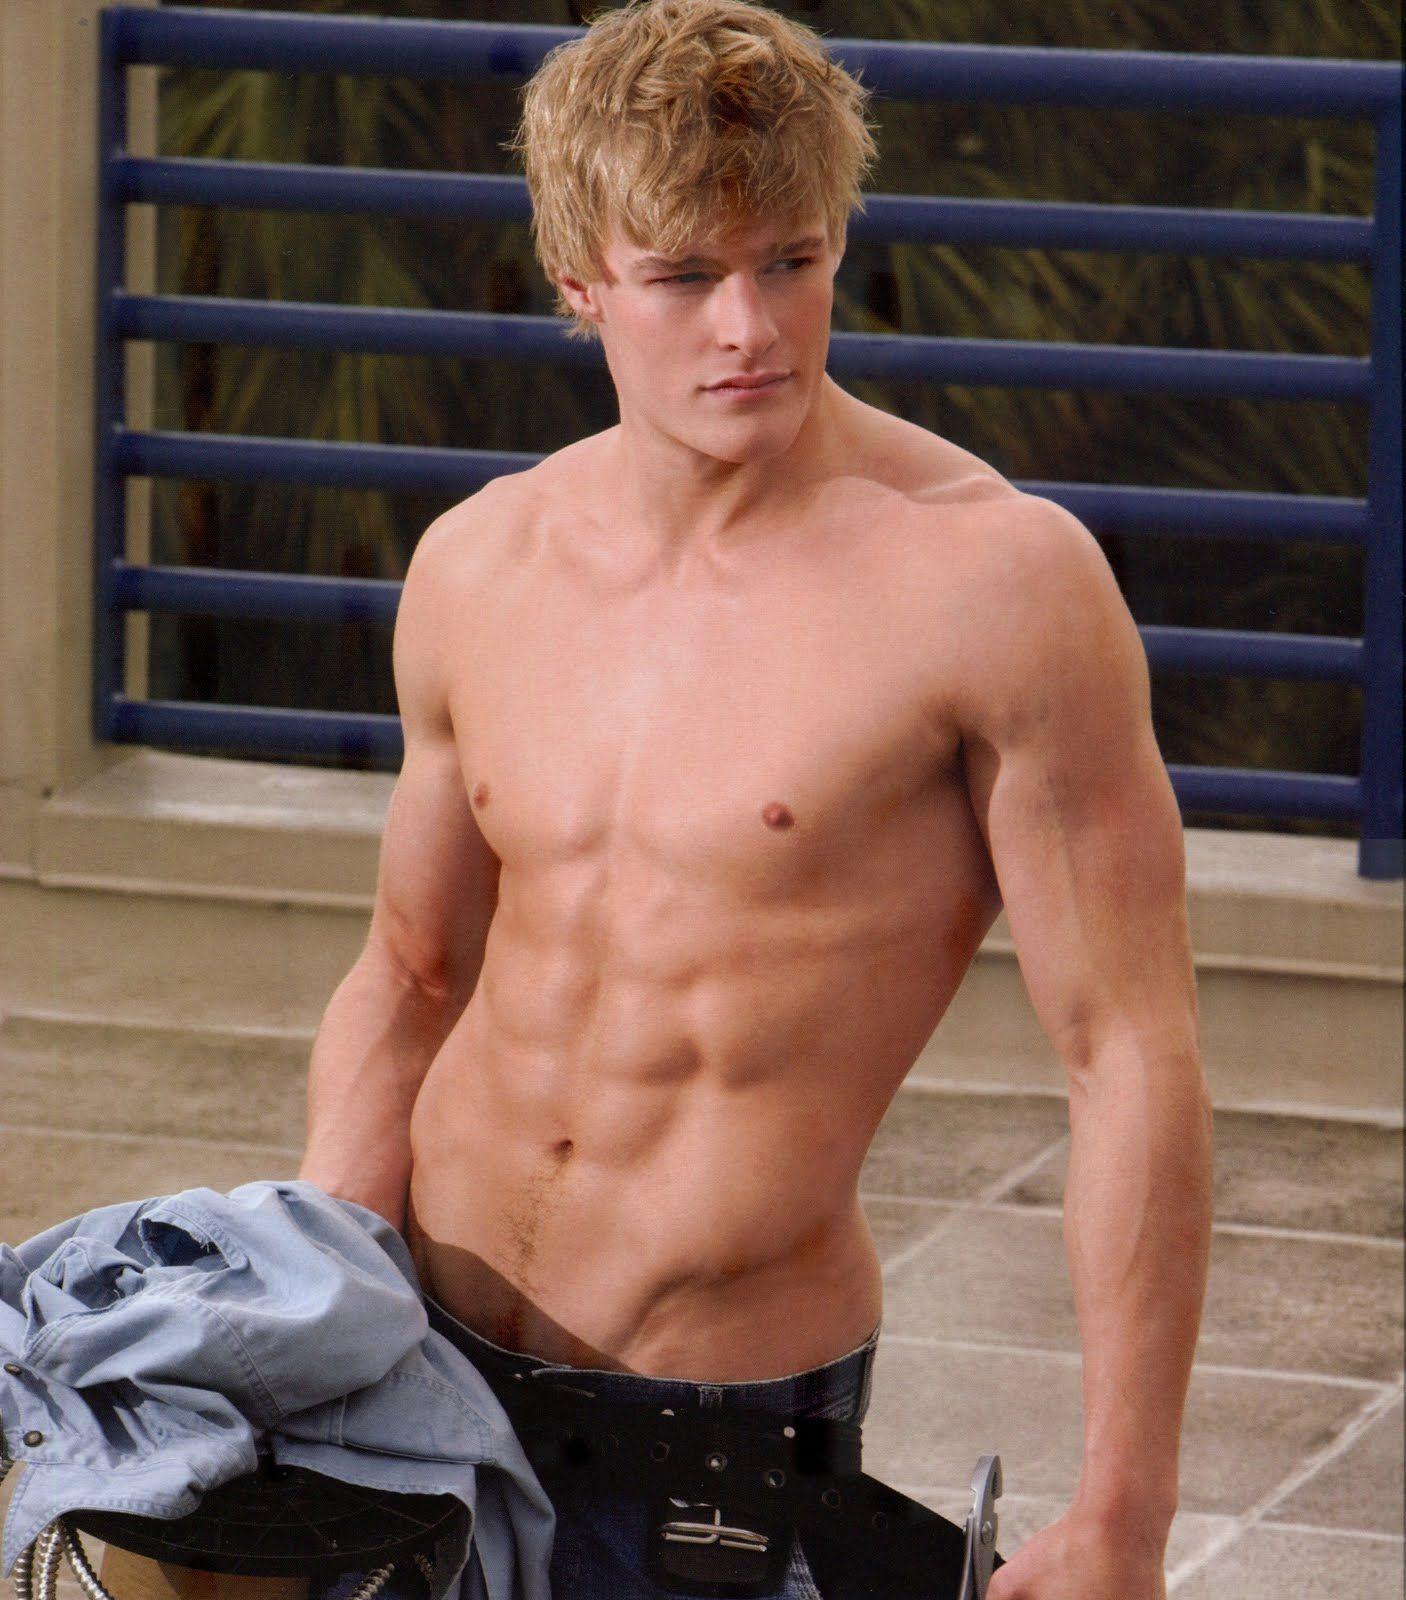 Orgias Con Rubias men just blond beautiful   hombres rubios, hombre fuerte, rubio